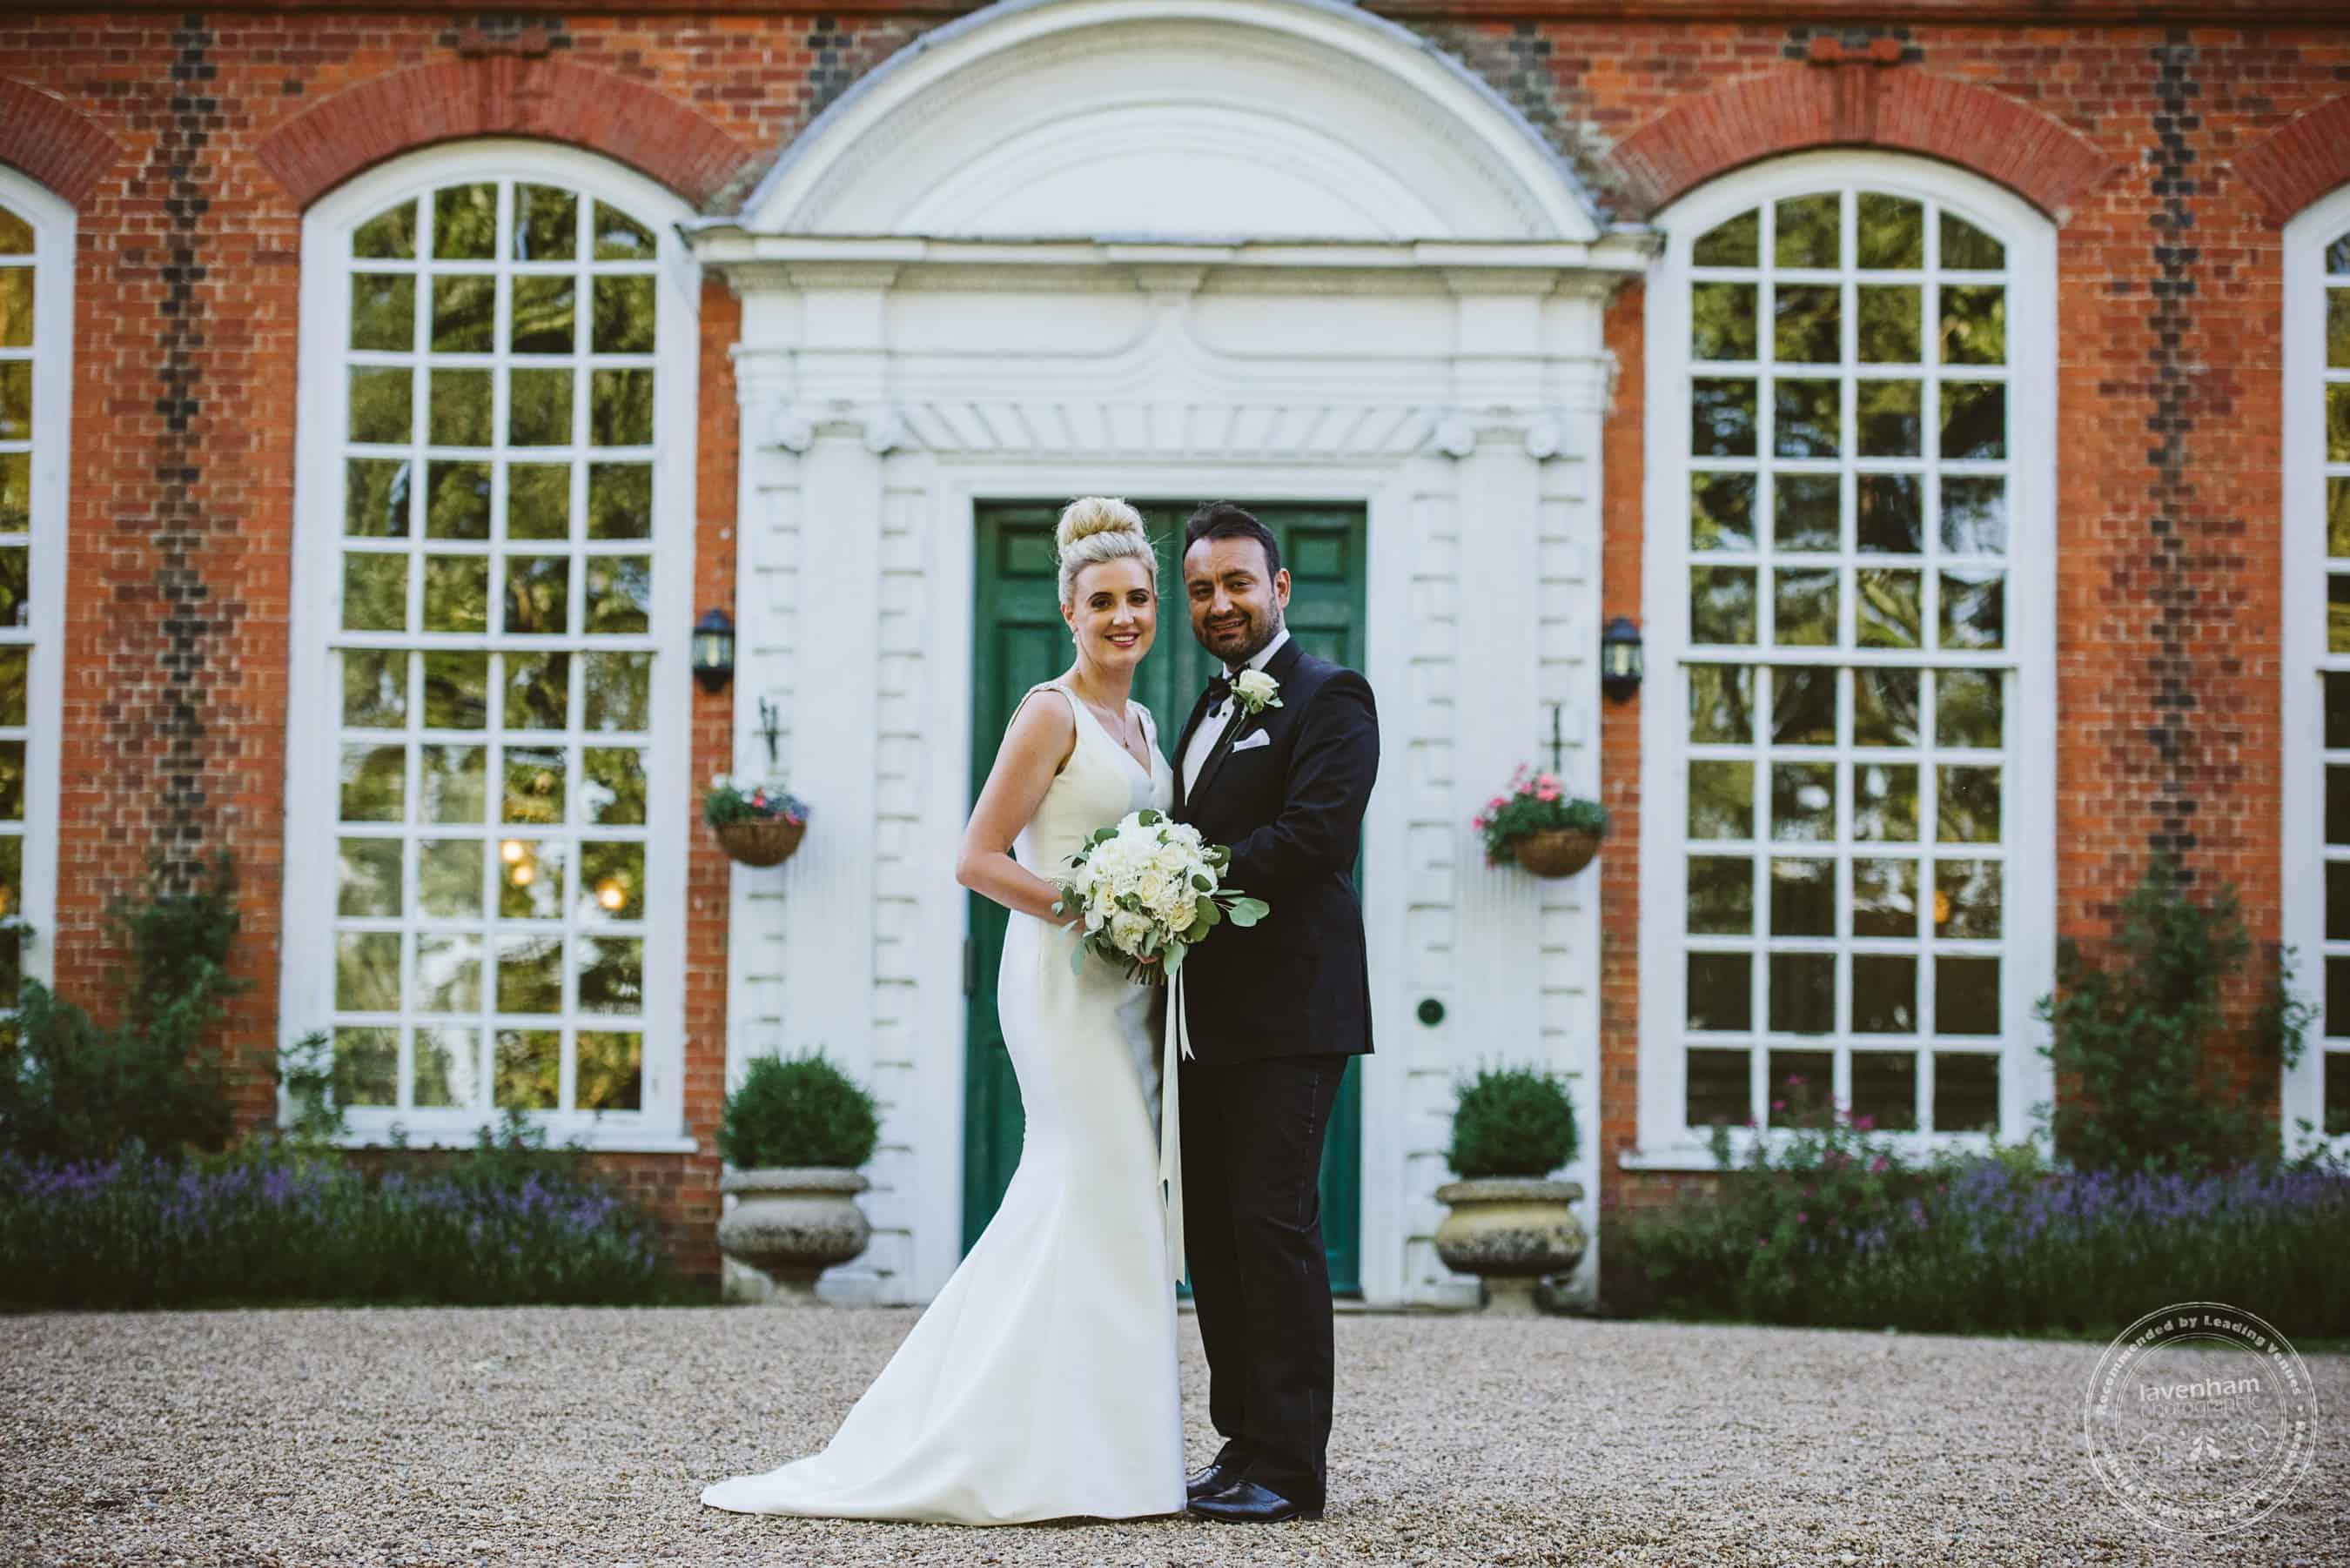 220618 Gosfield Hall Wedding Photography Lavenham Photographic 0155